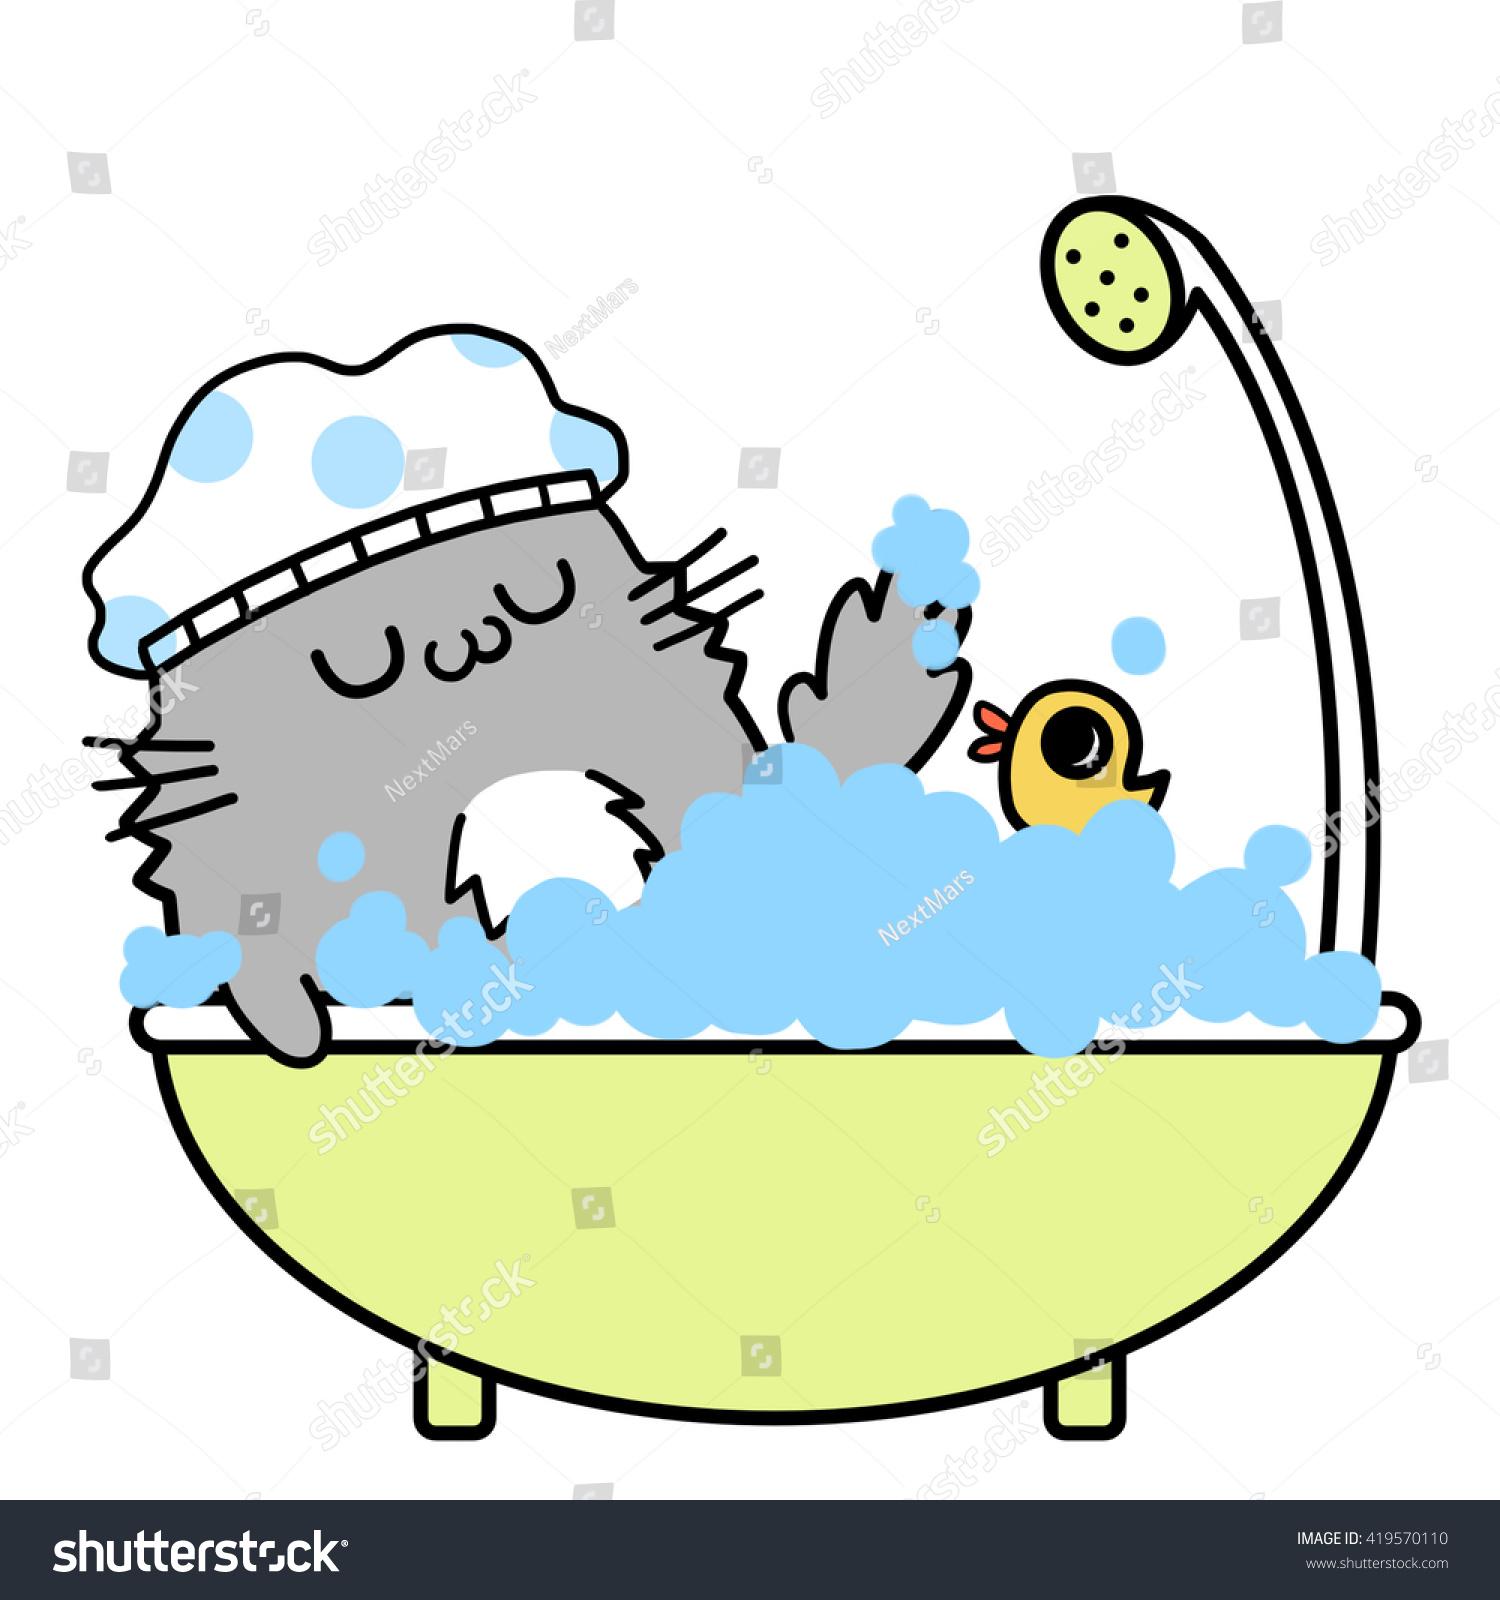 Bath Creative Cats Memories Take Happy Bath Creative Stock Illustration